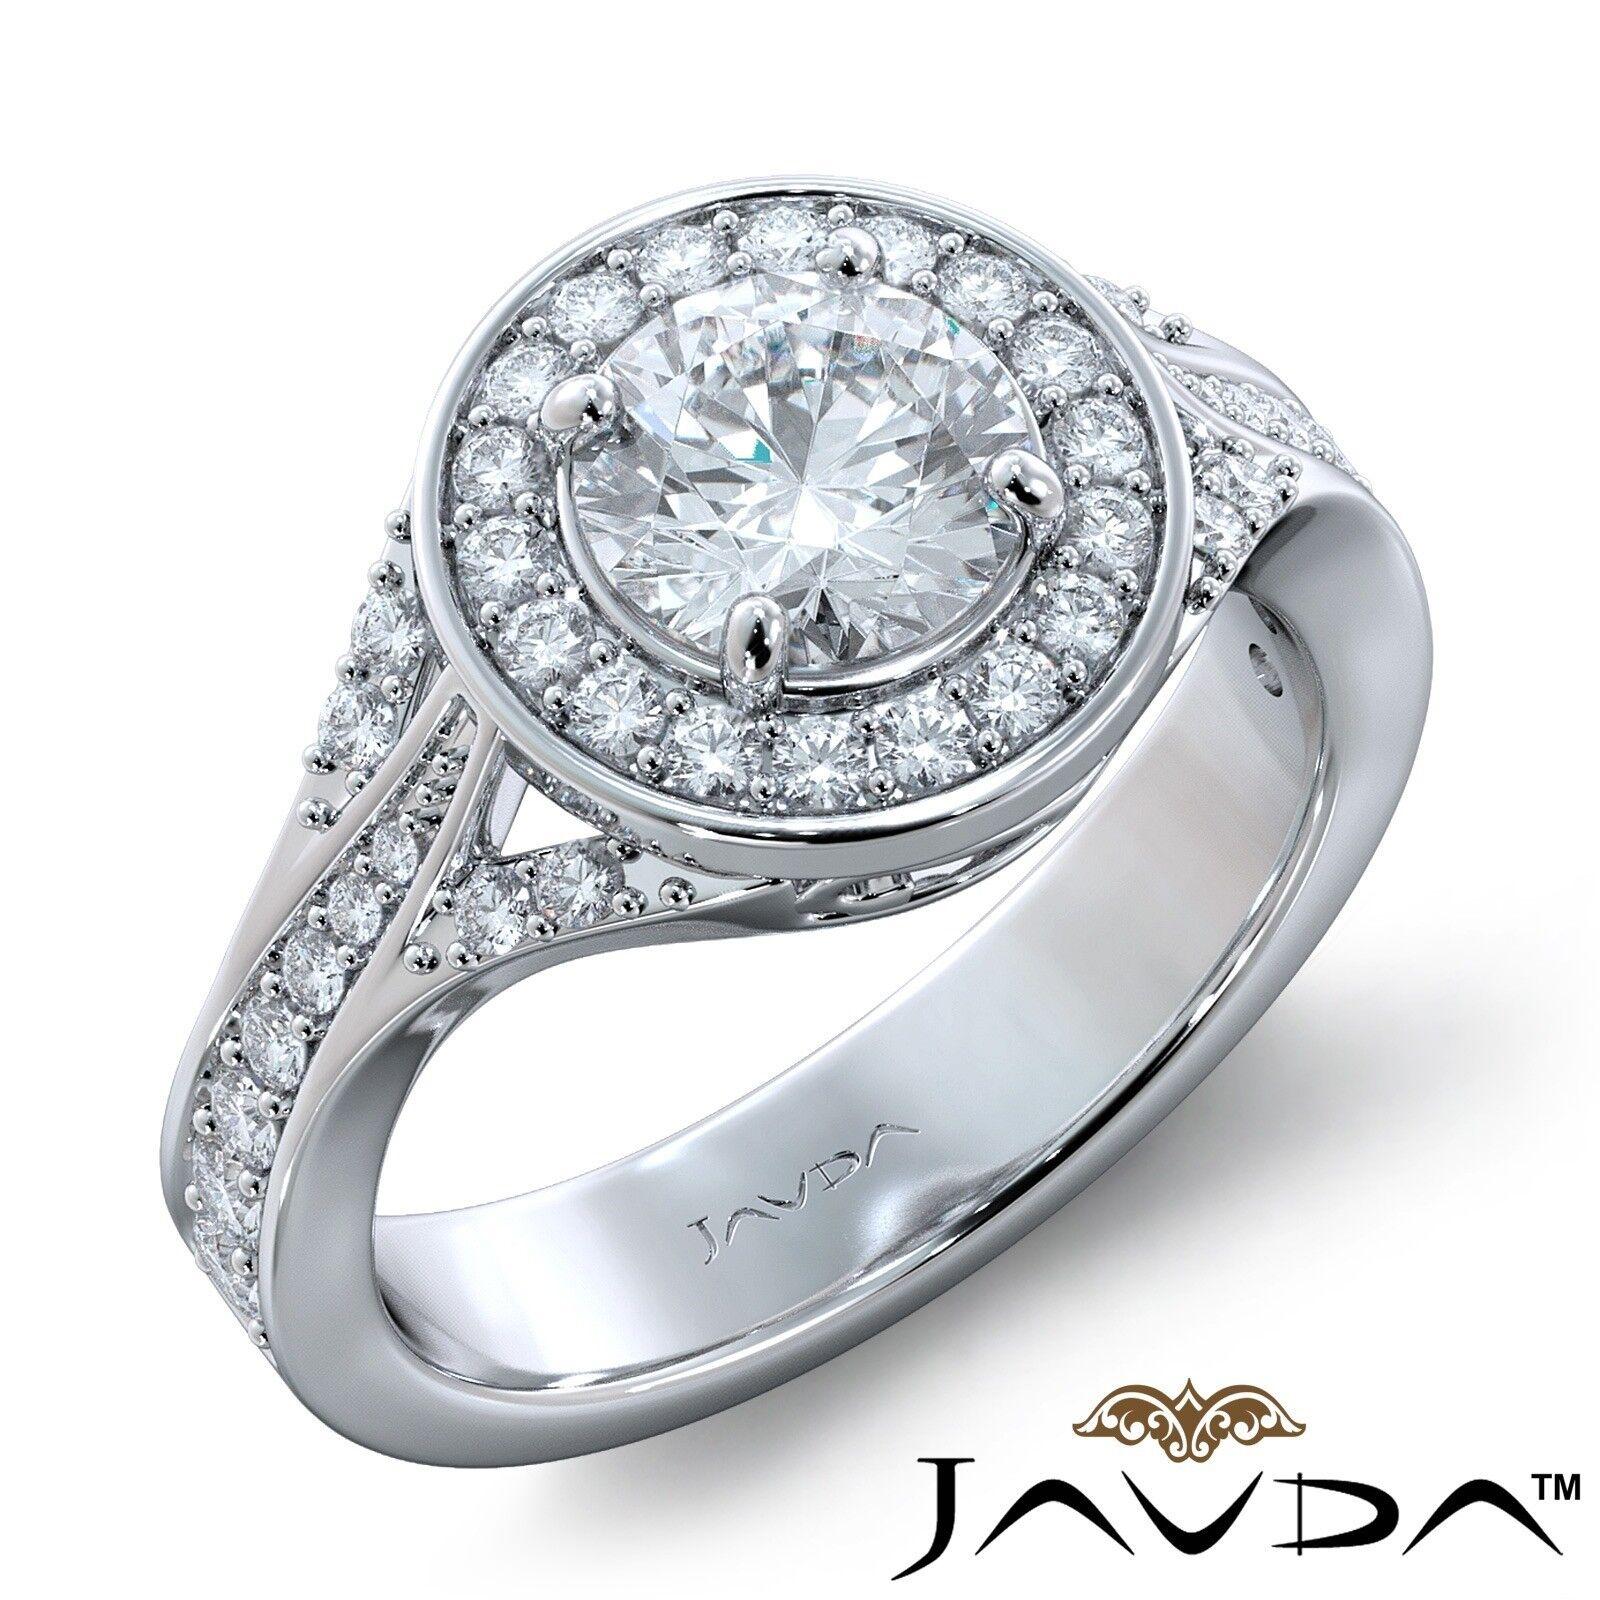 3.19ctw Halo Sidestone Pave Round Diamond Engagement Ring GIA G-SI1 White Gold